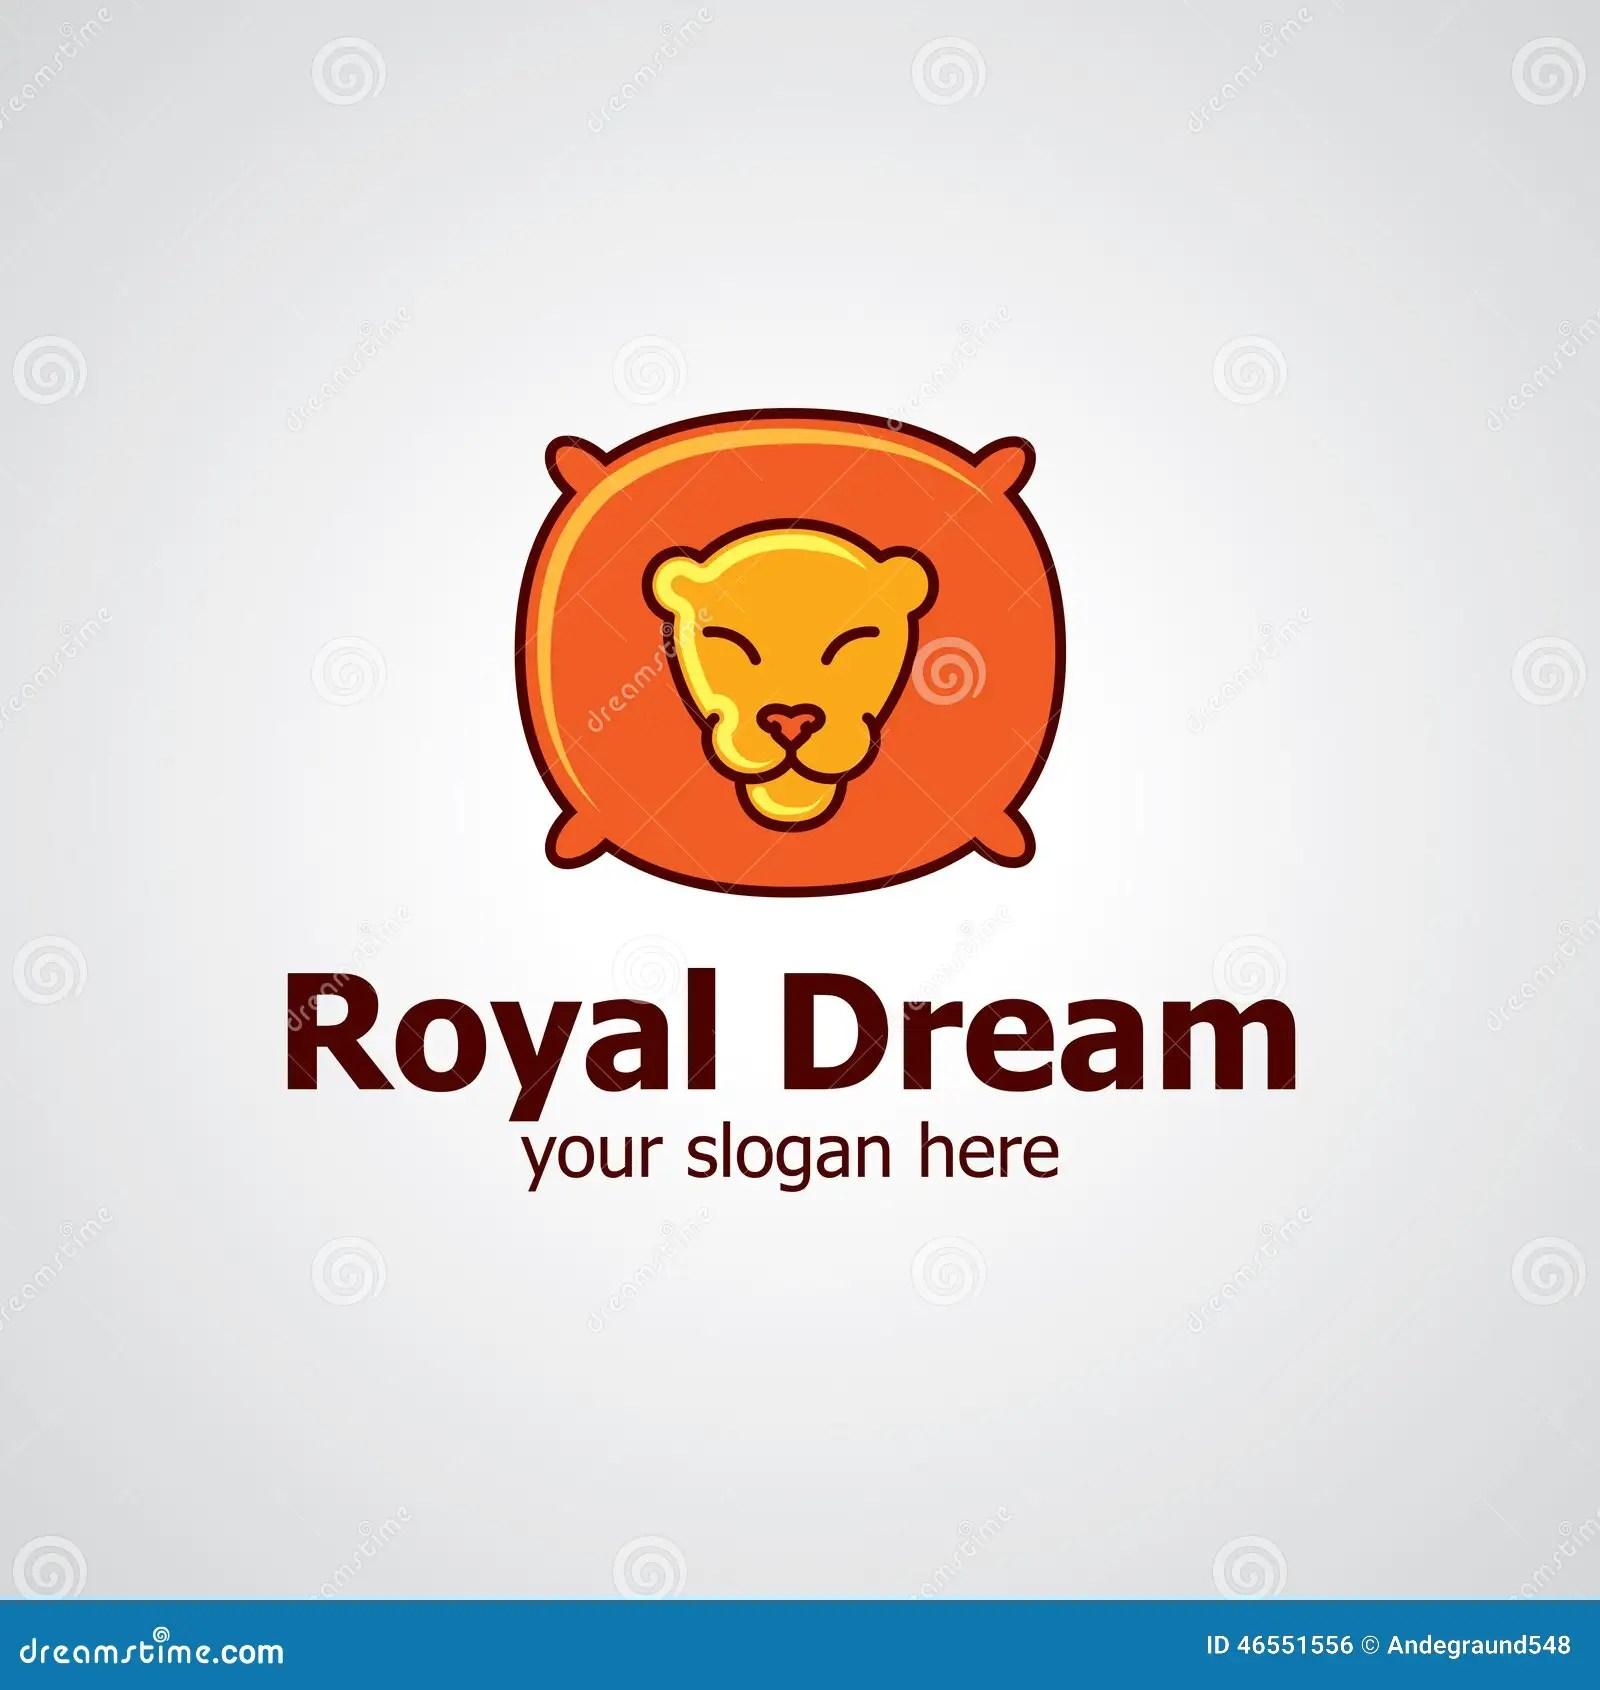 royal dream vector logo design stock vector illustration of royal textile 46551556